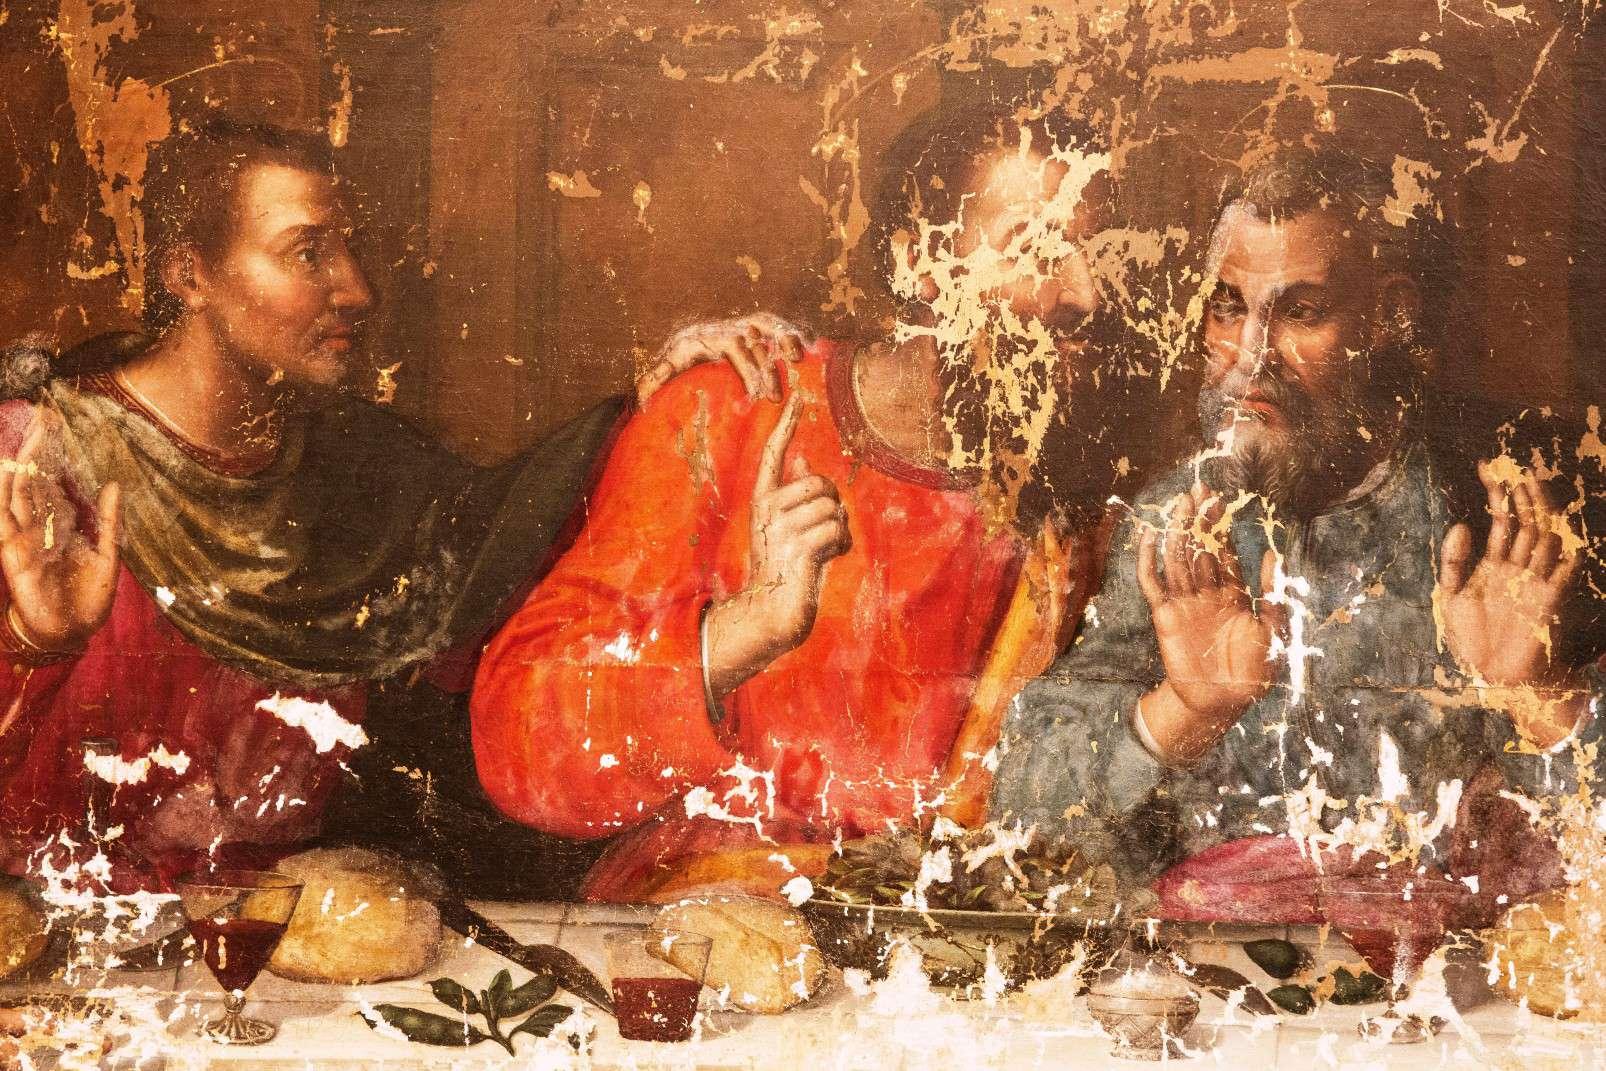 Last Supper by Plautilla Nelli - Adopt an Apostle - Saint Thomas awaits 'adoption', photo by Kirsten Hills